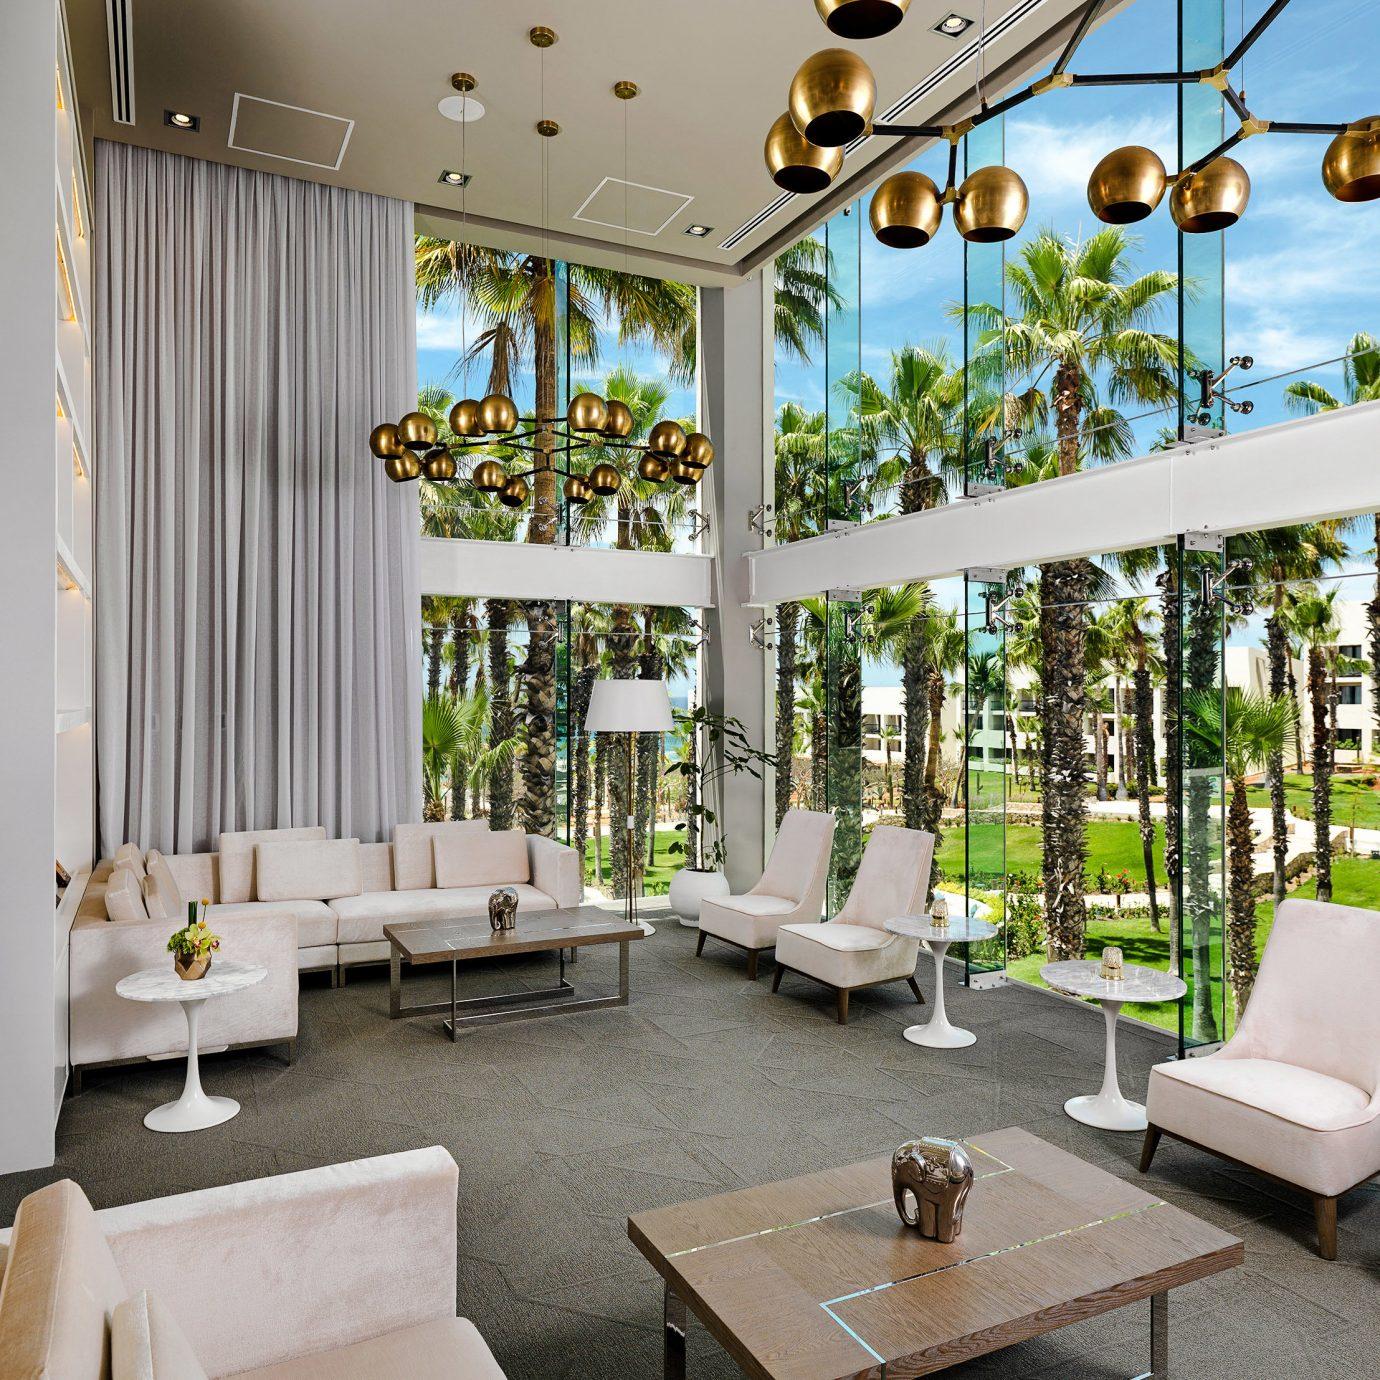 Hotels Travel Tips Trip Ideas living room home Lobby interior designer restaurant